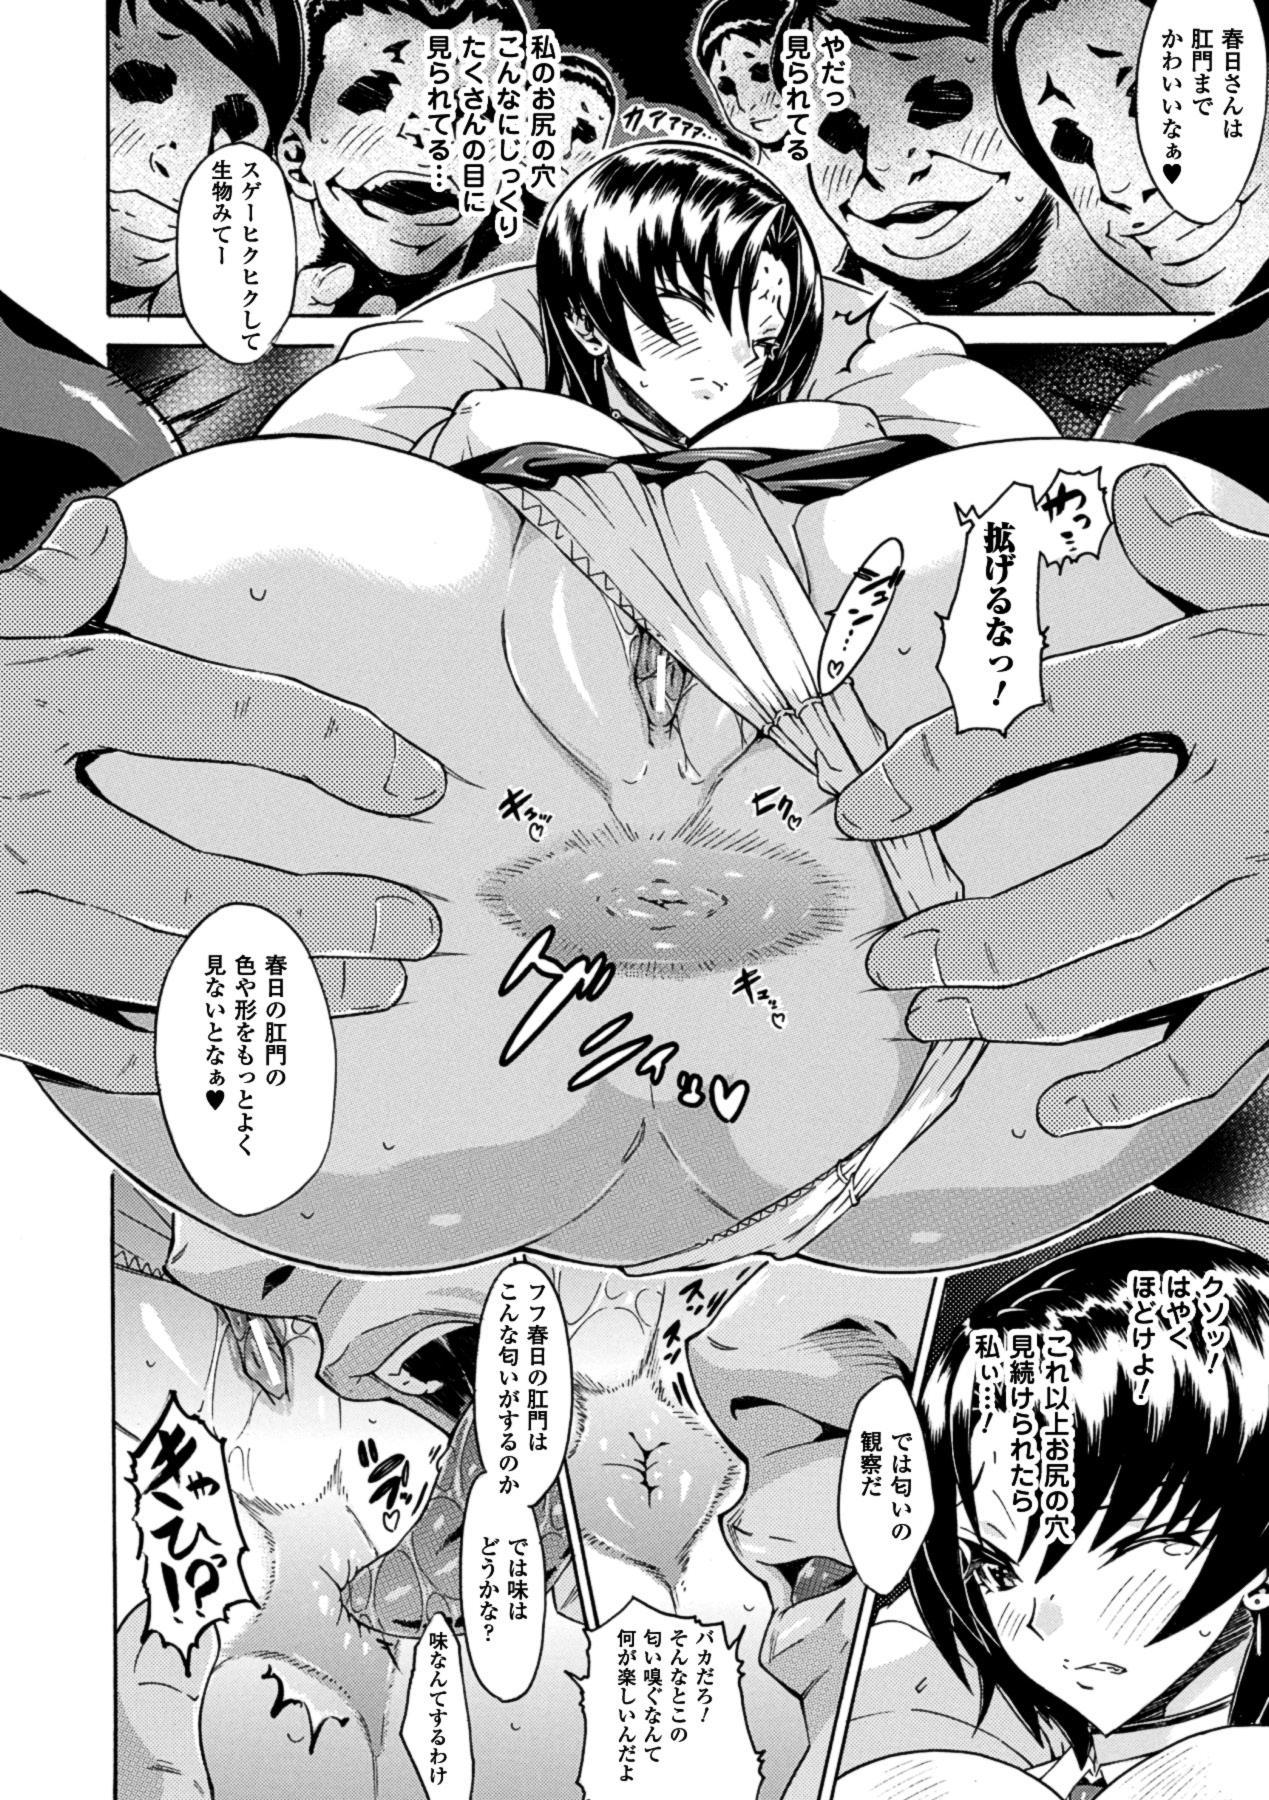 Megami Crisis 10 165